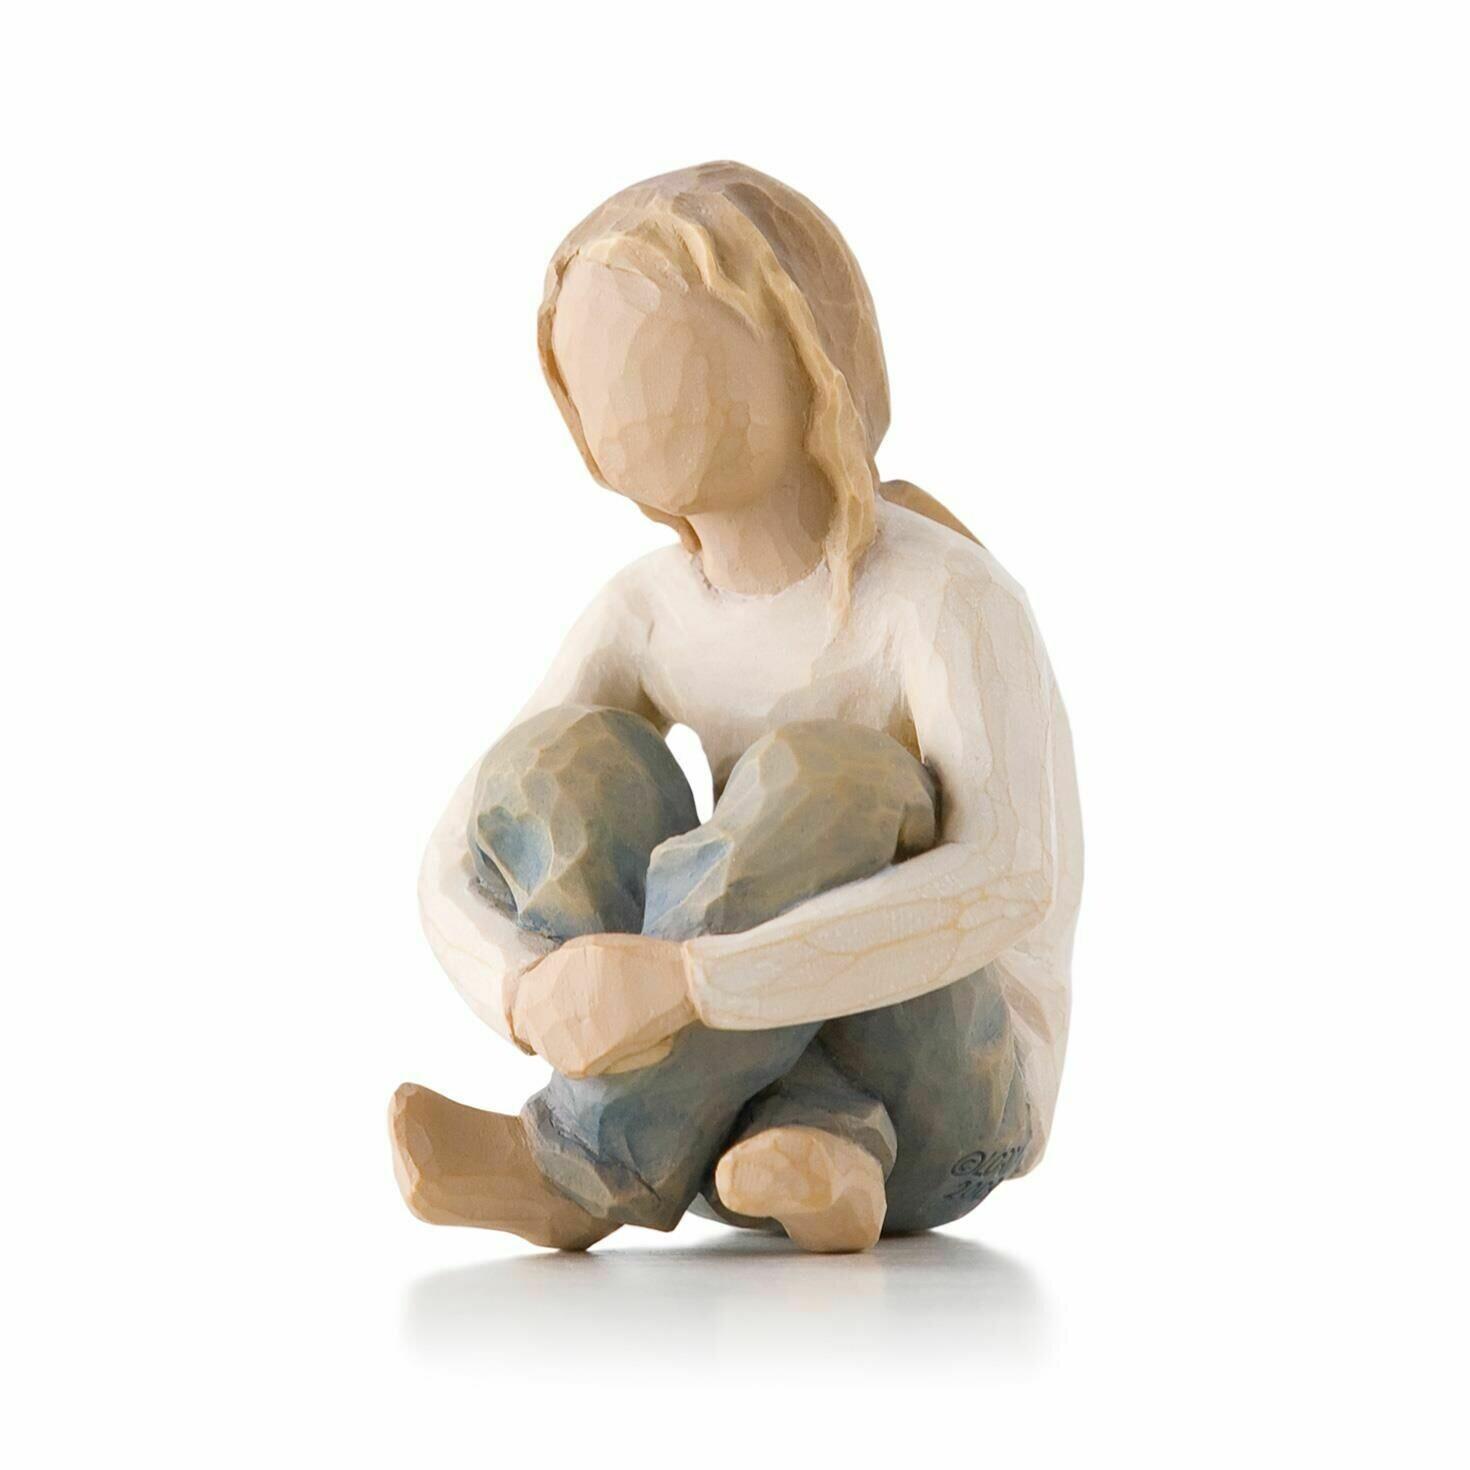 Willow Tree: Spirited Child - Girl Sitting Crossed Legged